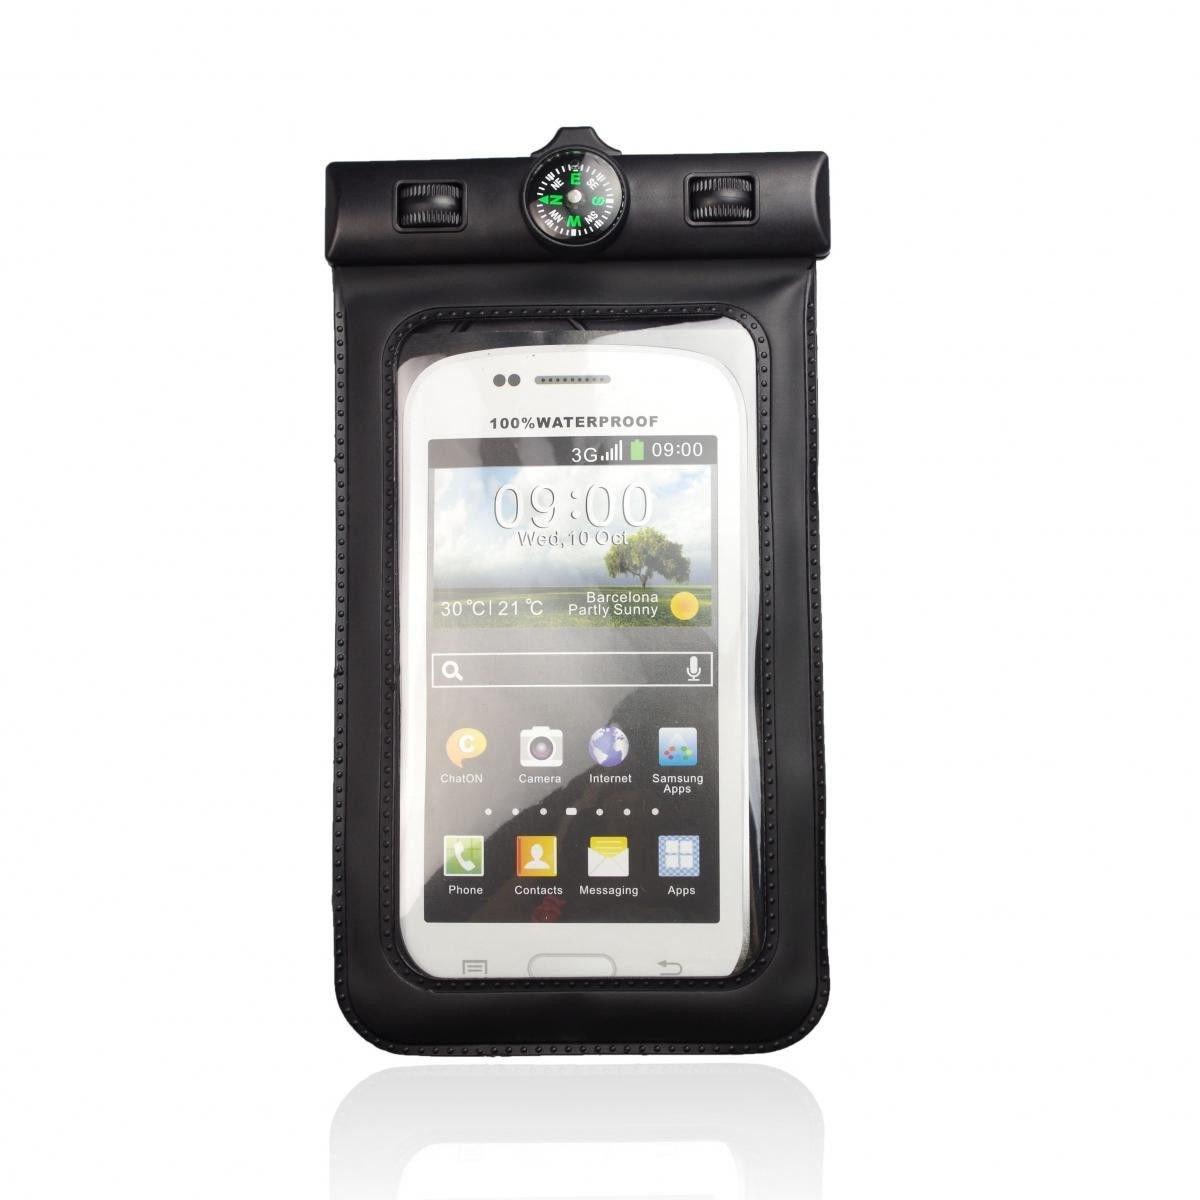 Waterproof Case Armband & Neck Strap For Samsung Galaxy S3 S4 S5 LG G2 Nexus5